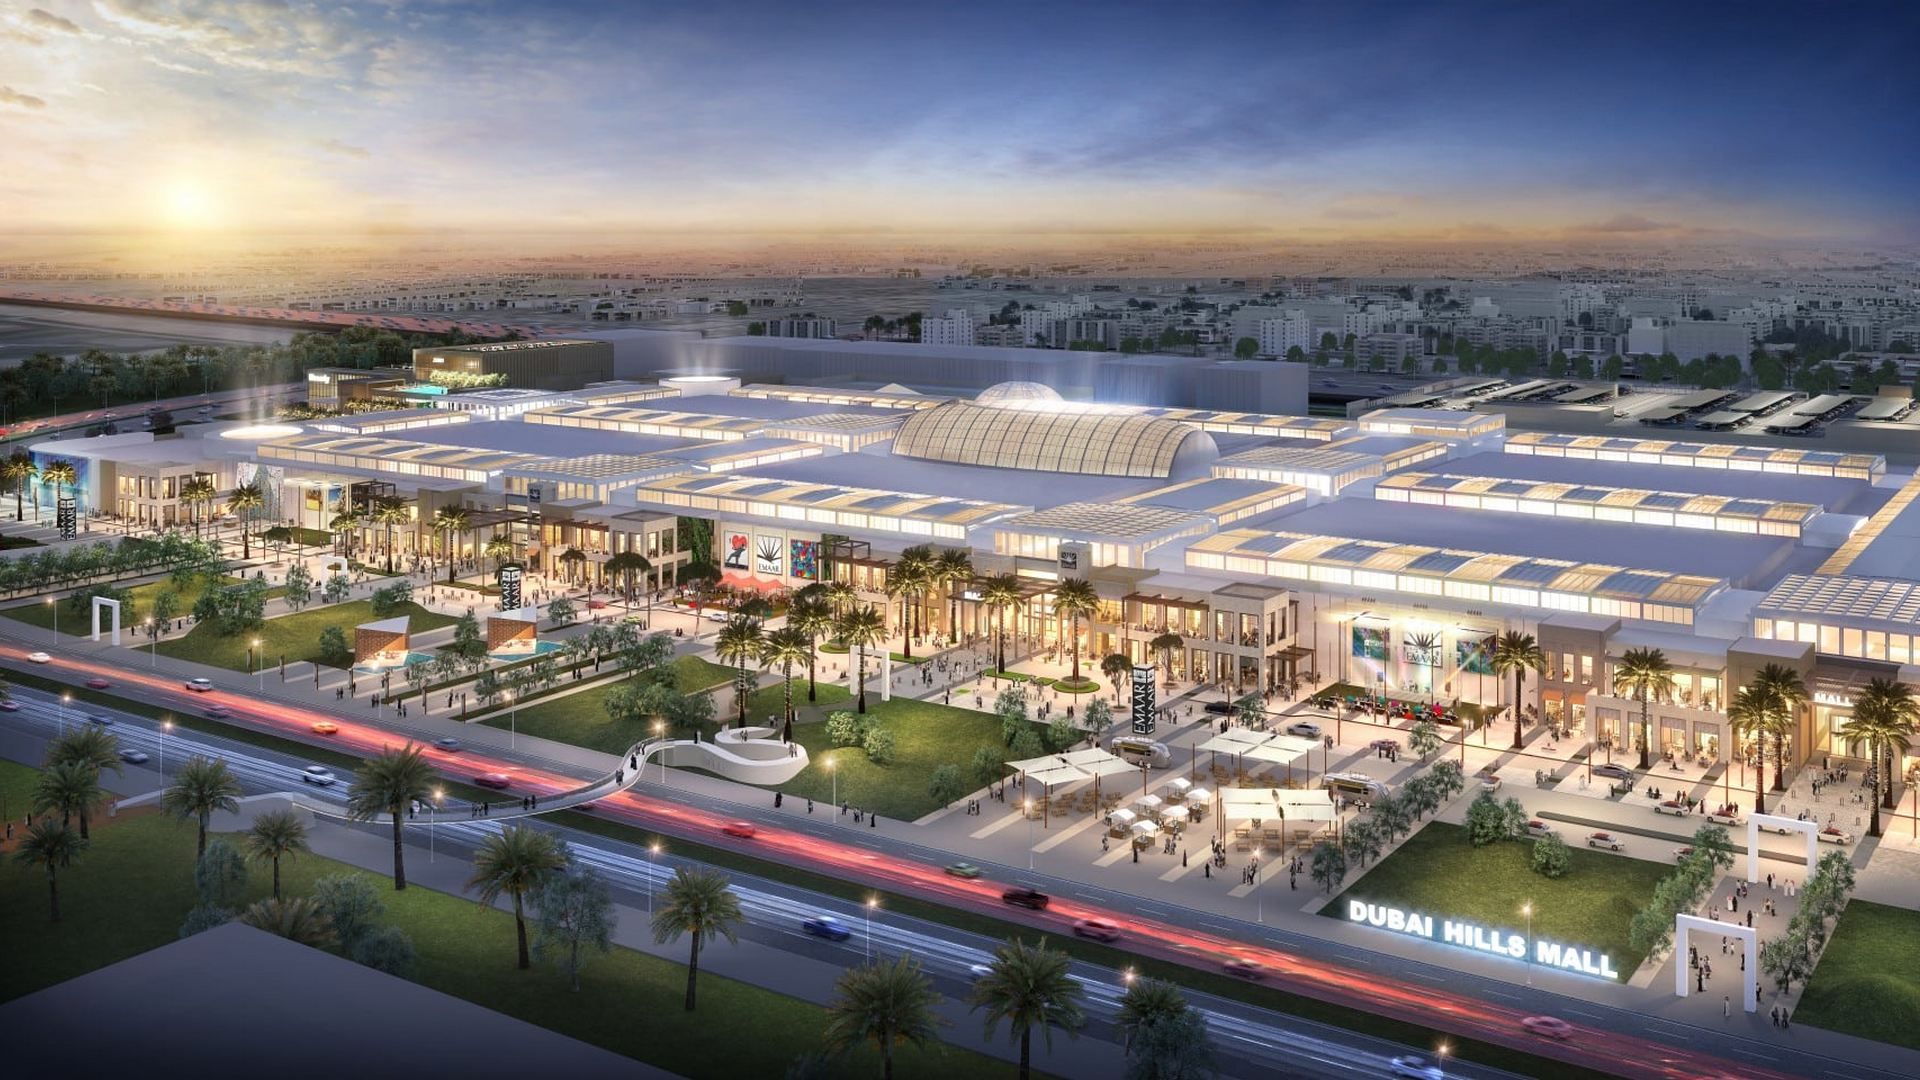 Dubai Hills Estate - 11